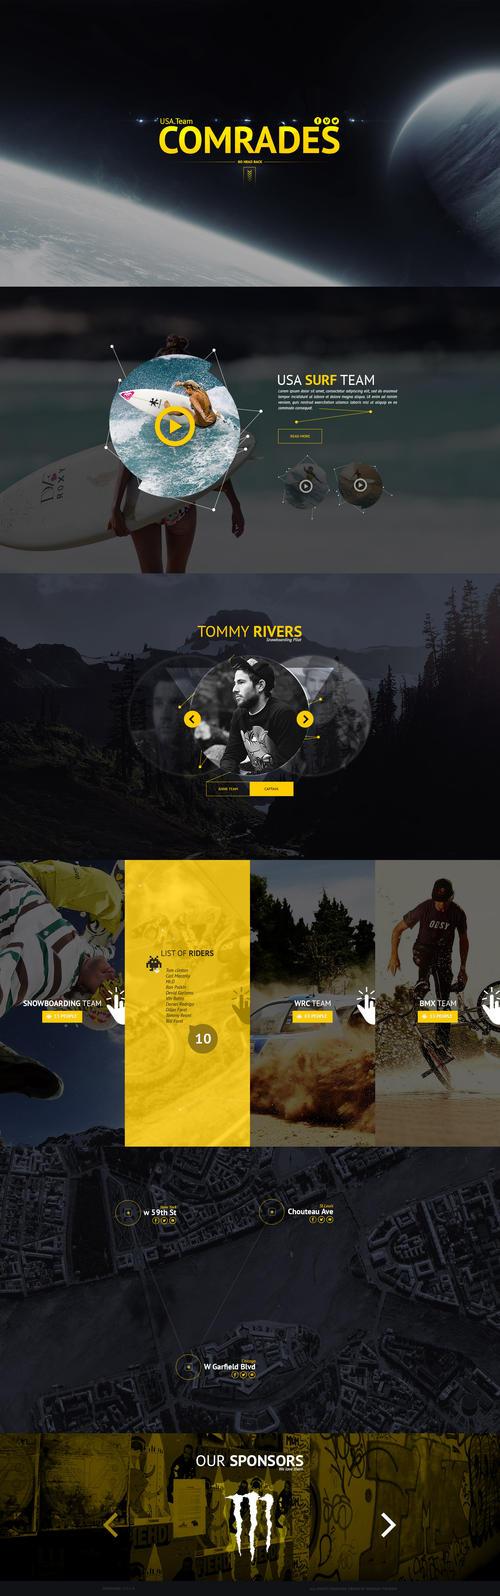 Landing Page - USA. Team Comrades by Shizoy